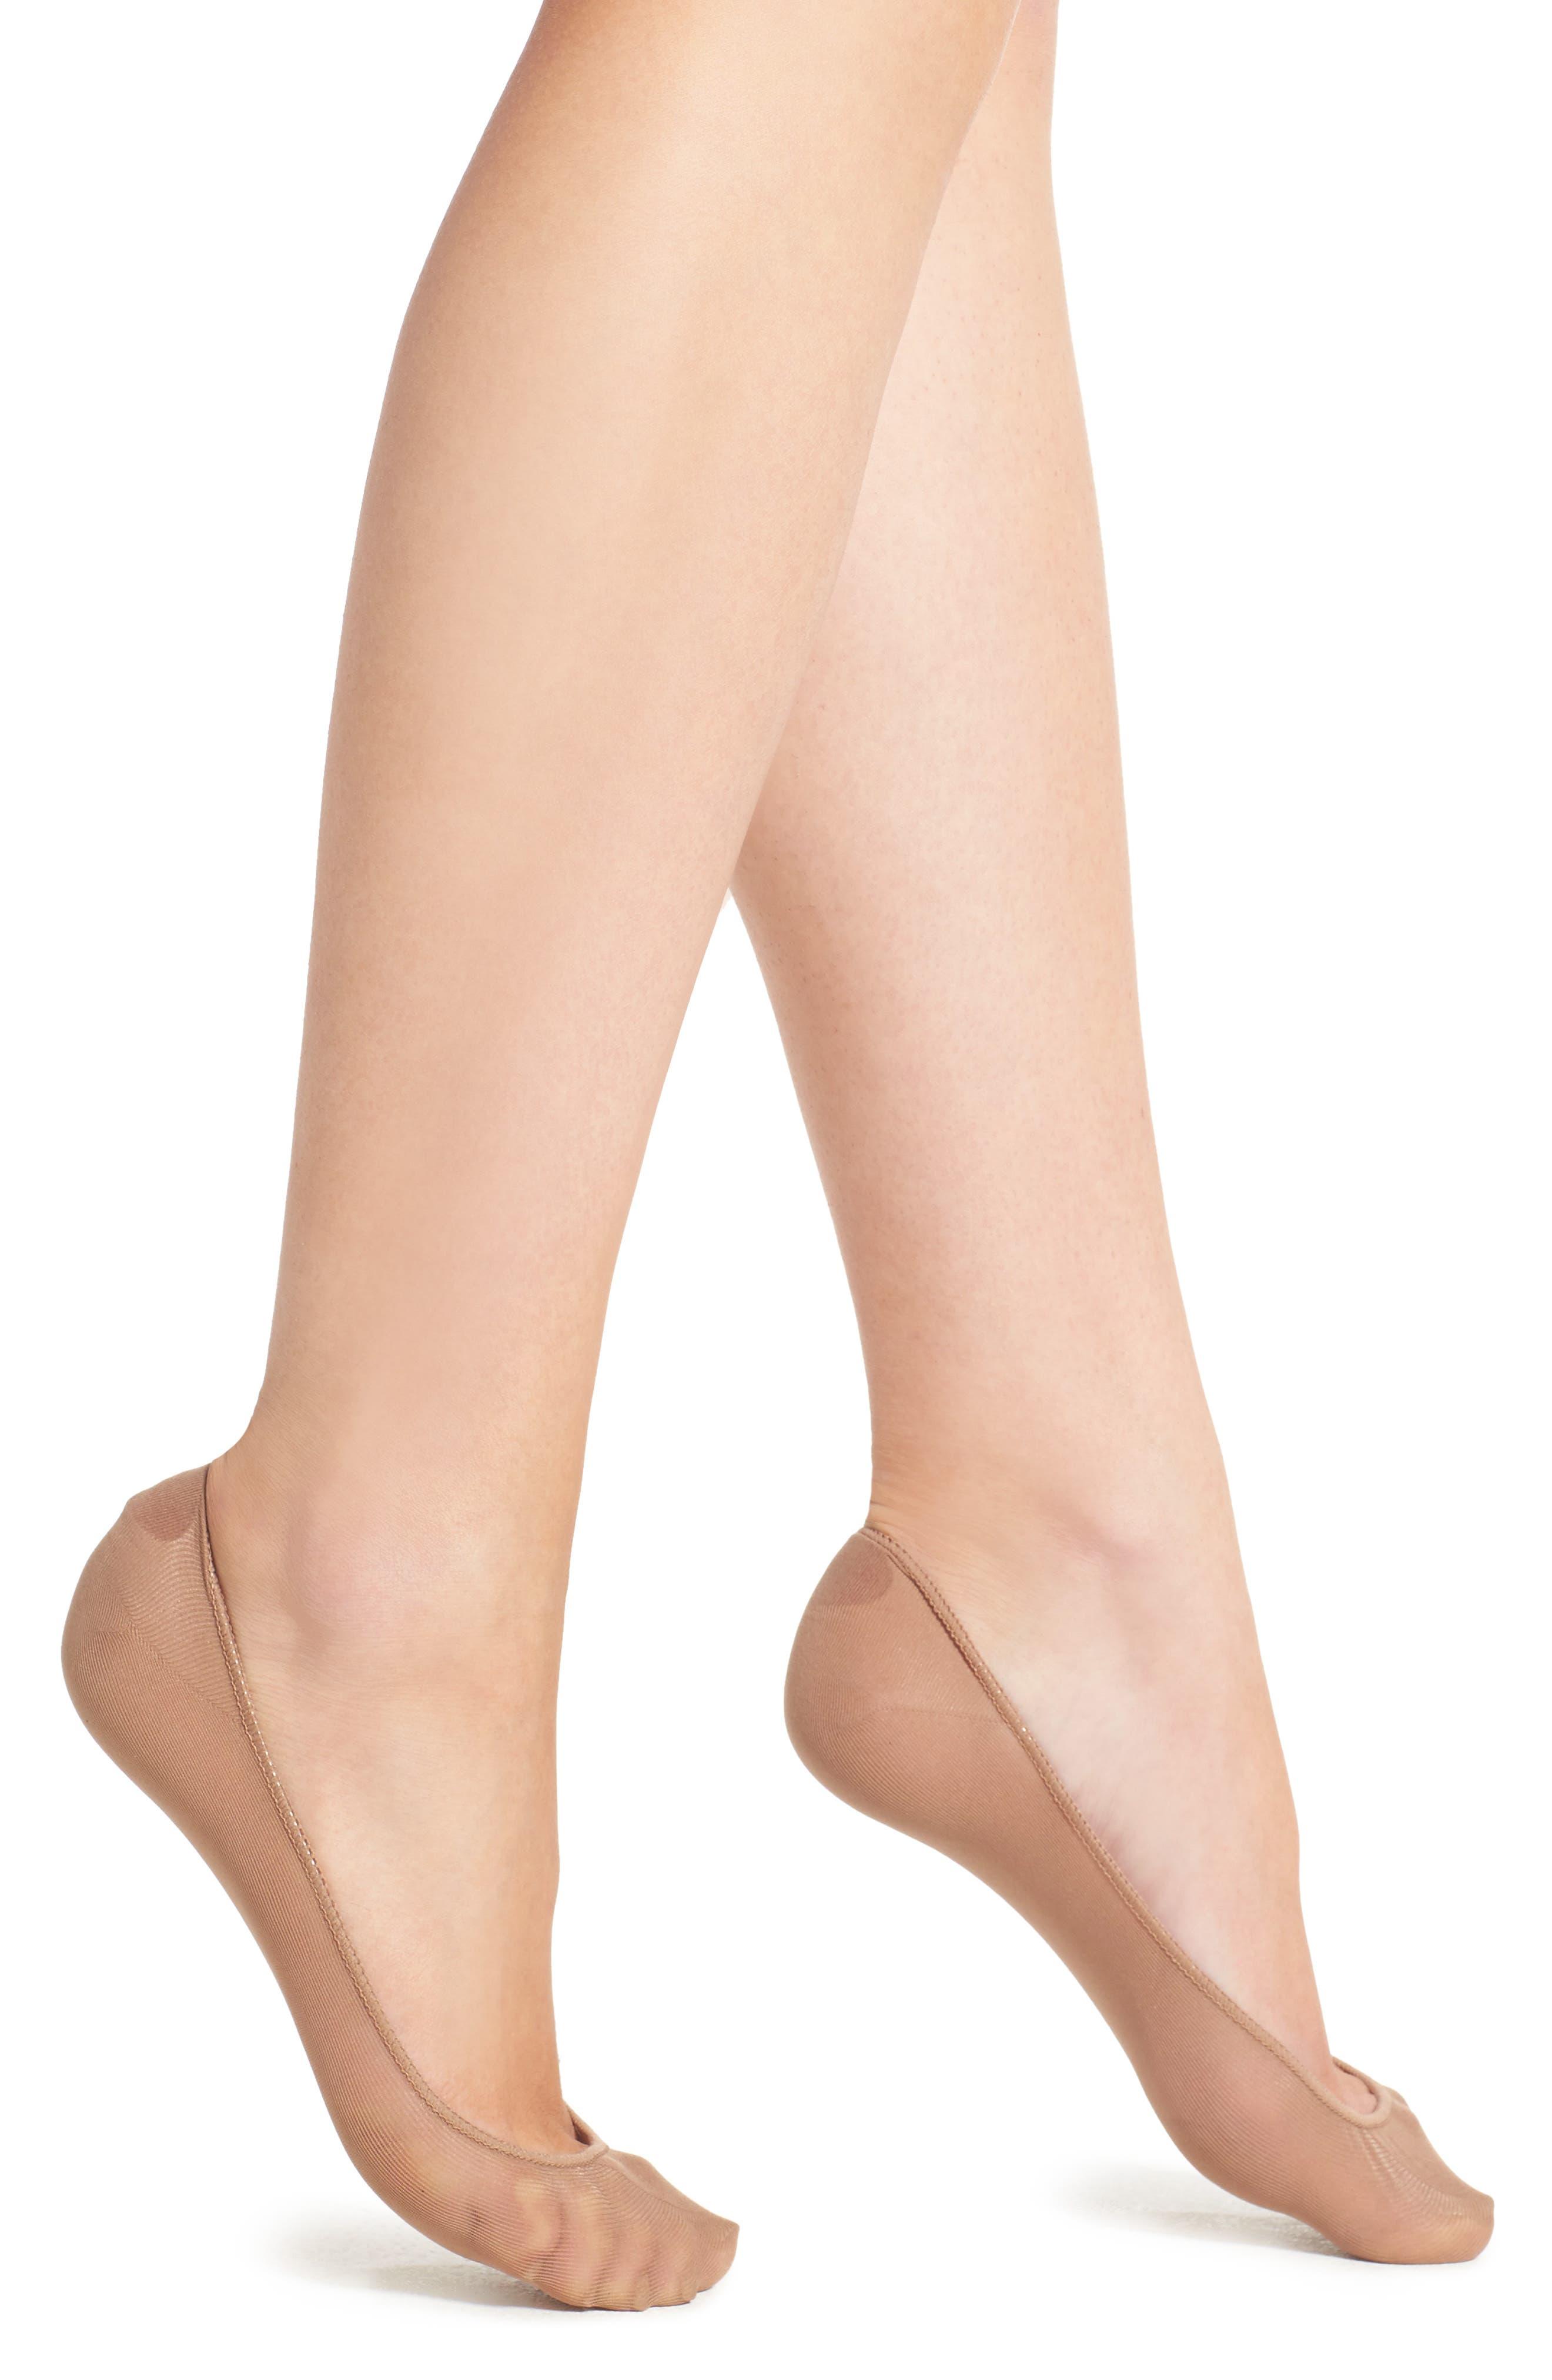 Alternate Image 1 Selected - Hue No-Show Socks (3 for $16)